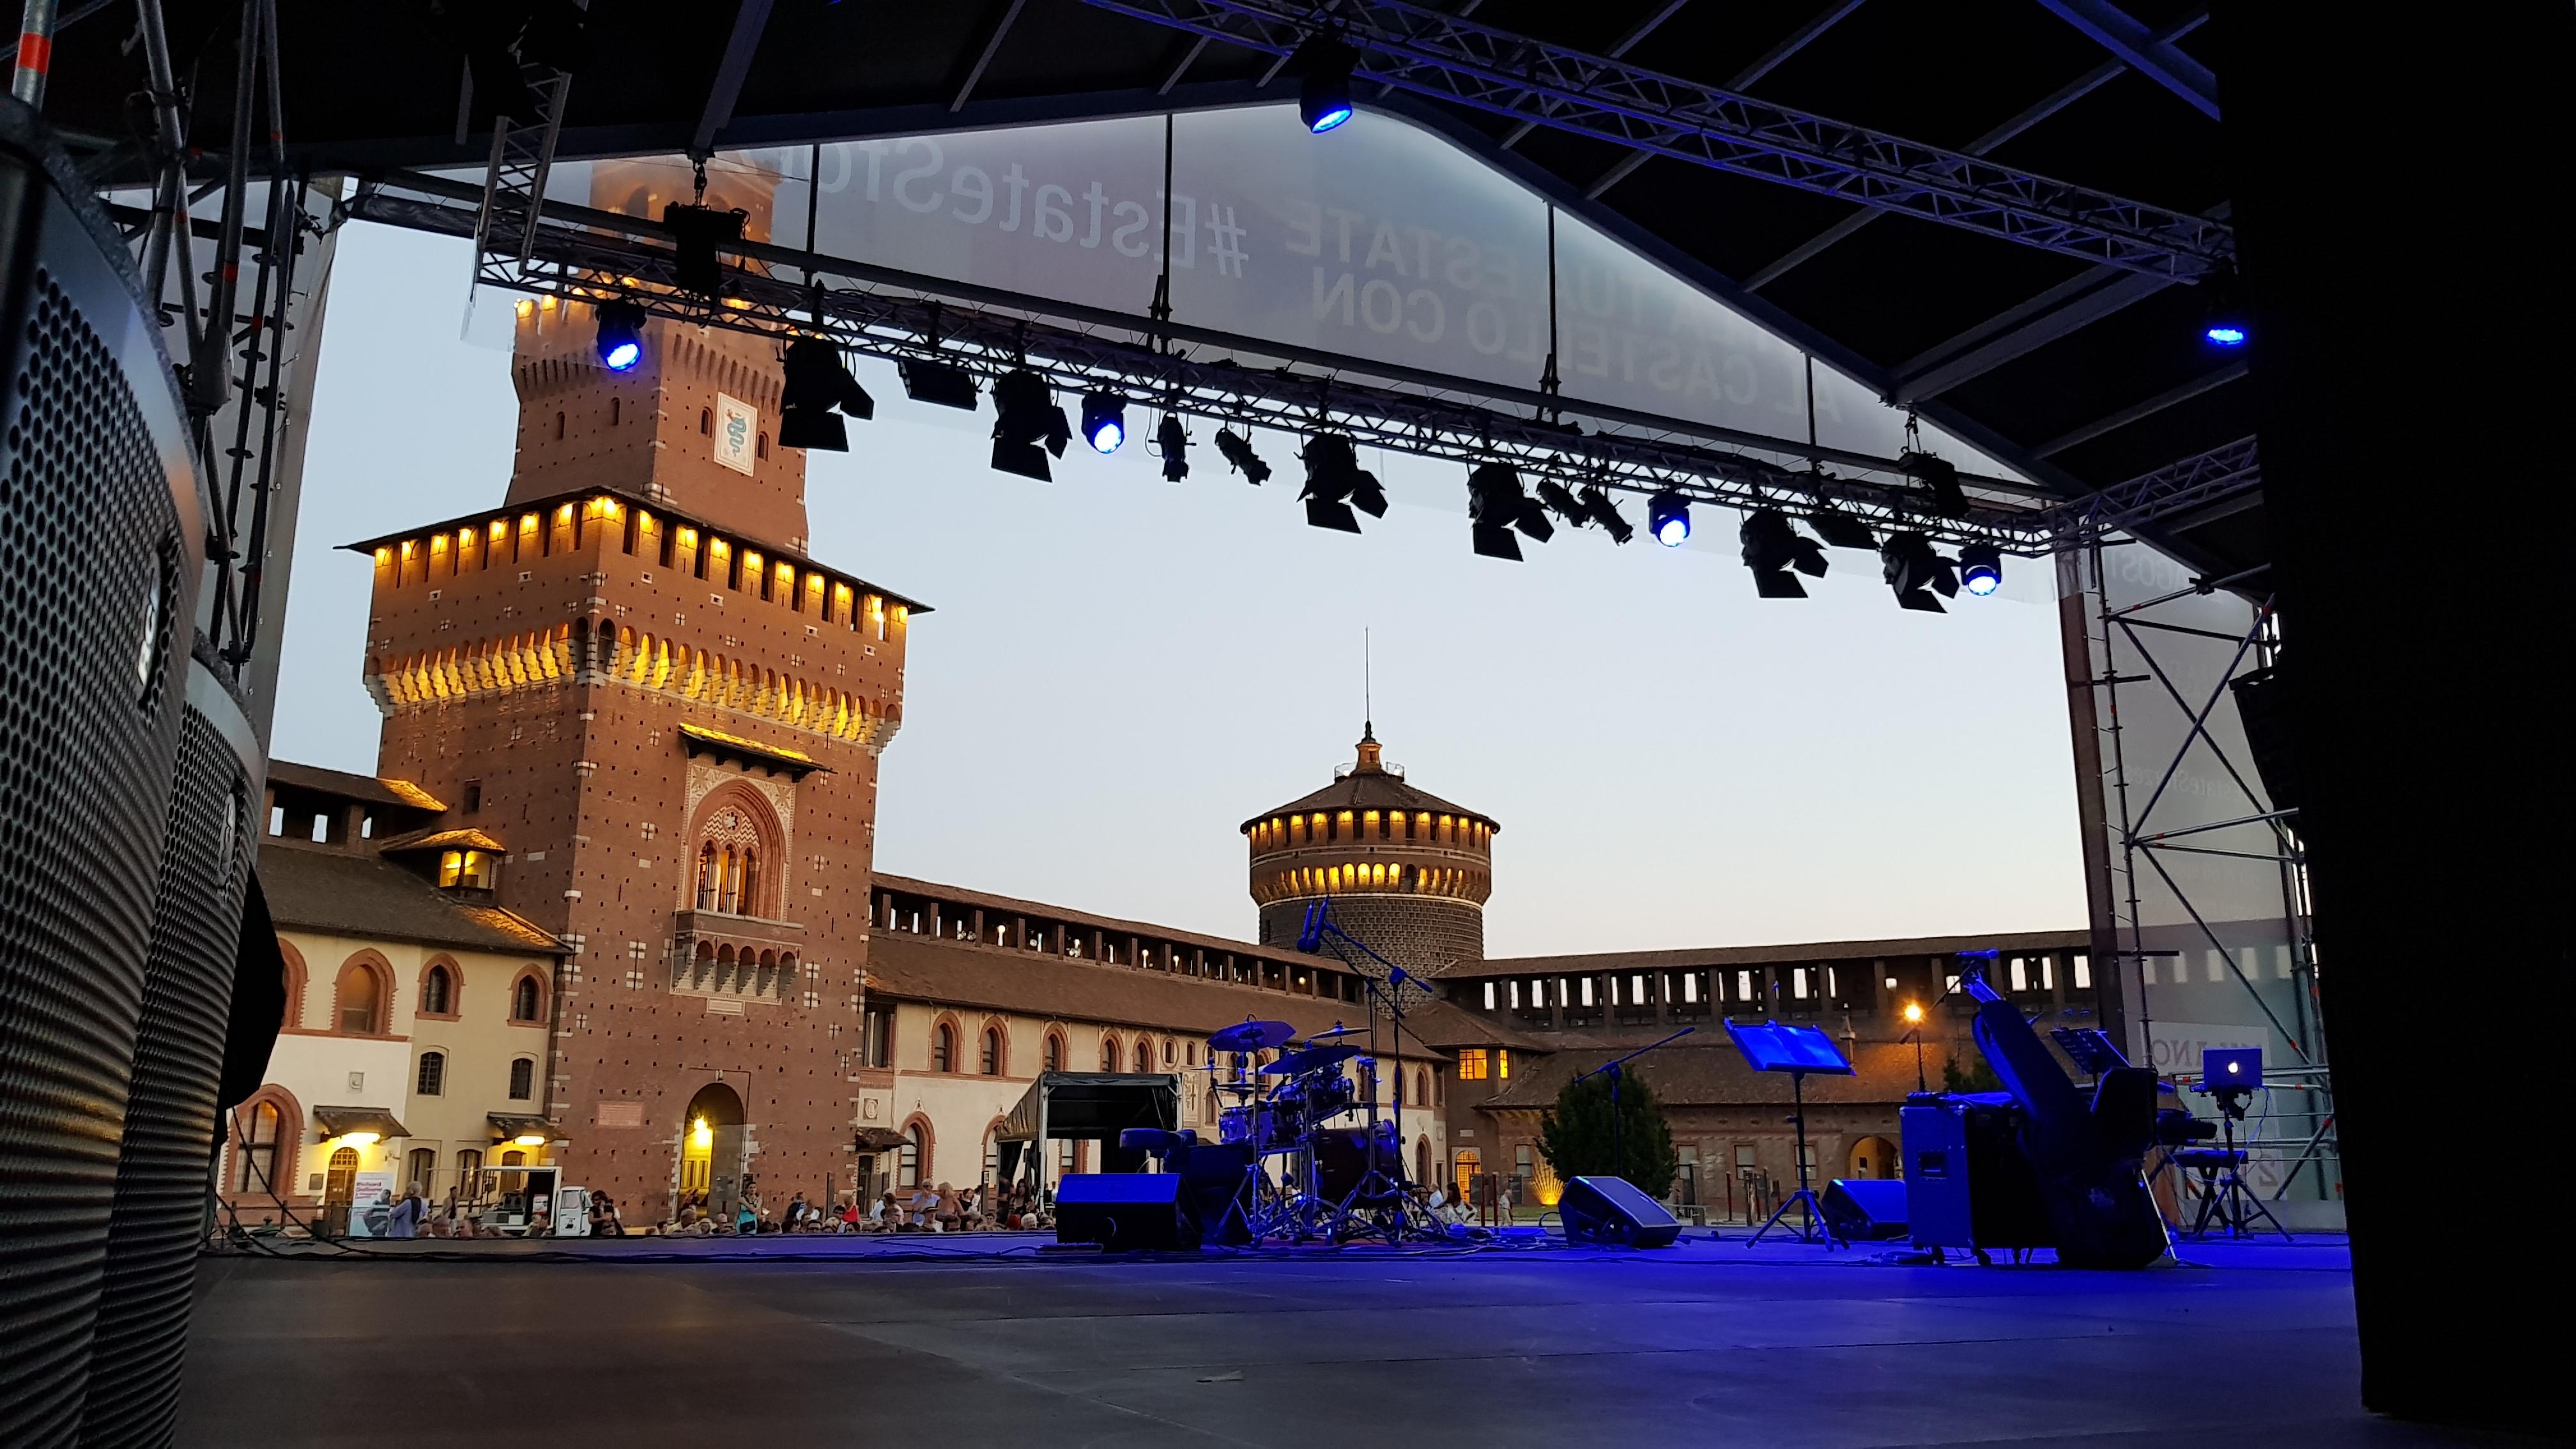 WALTANJAZZ jazz concert at Sforzesco Castle 2017, Milan Italy